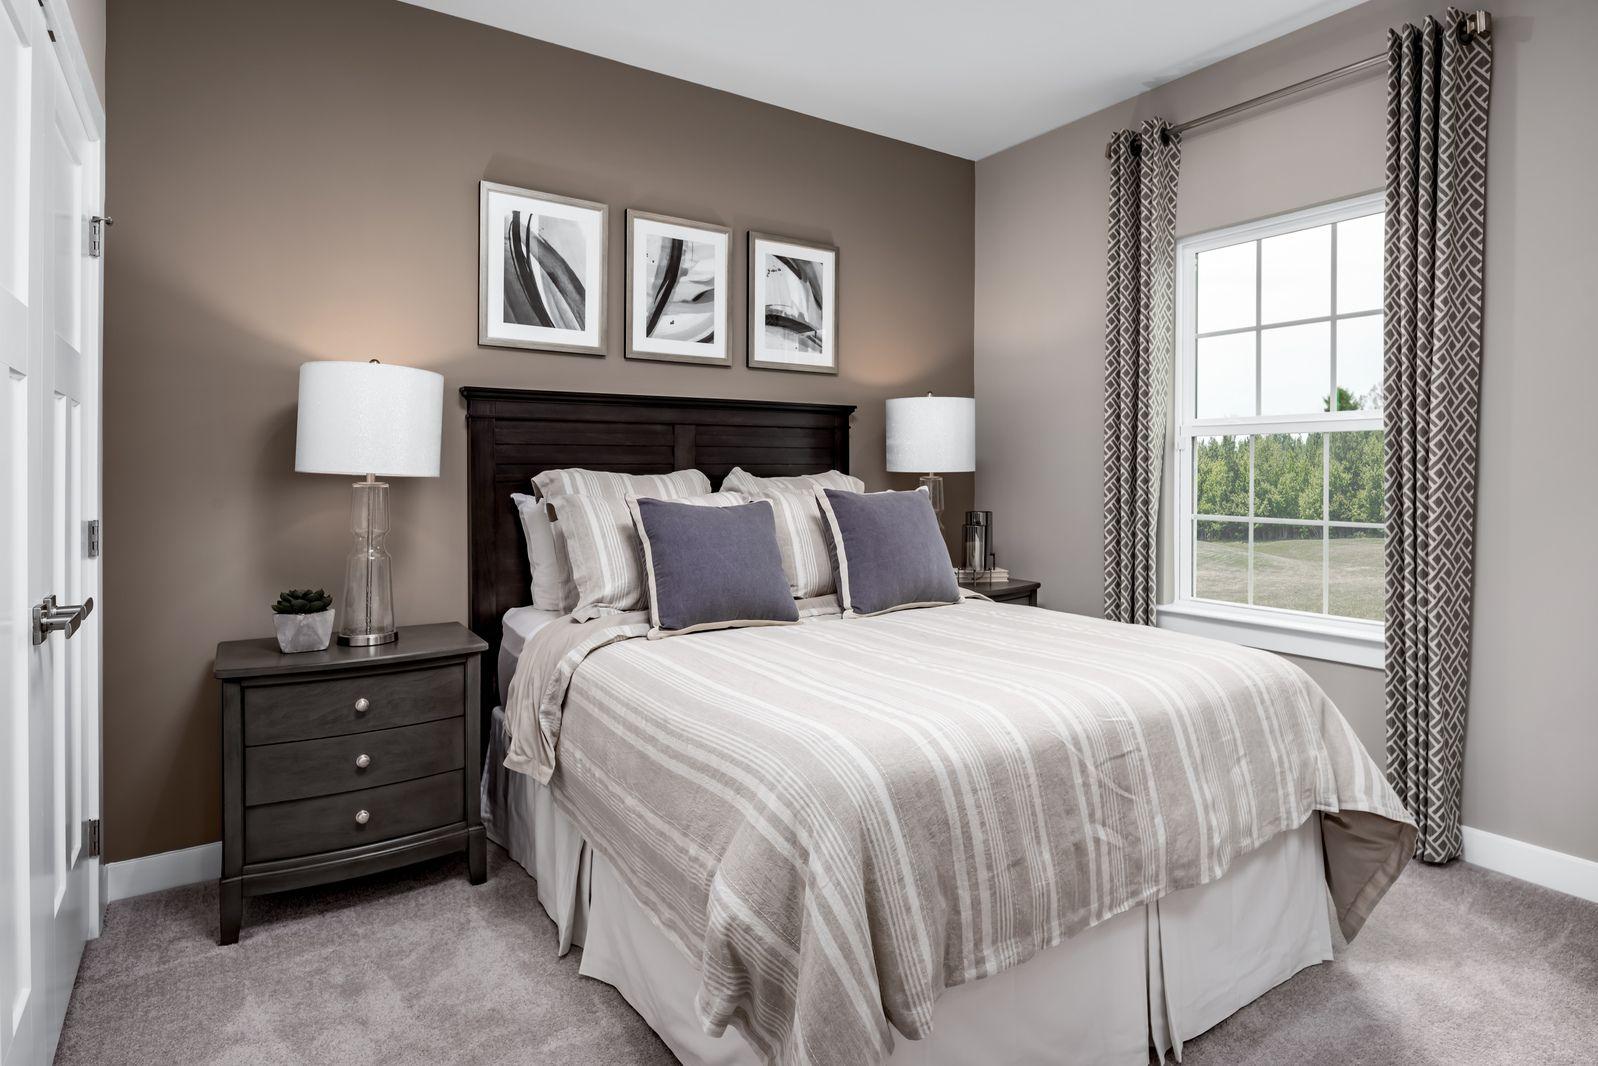 Bedroom featured in the Alberti Ranch By Ryan Homes in Dover, DE